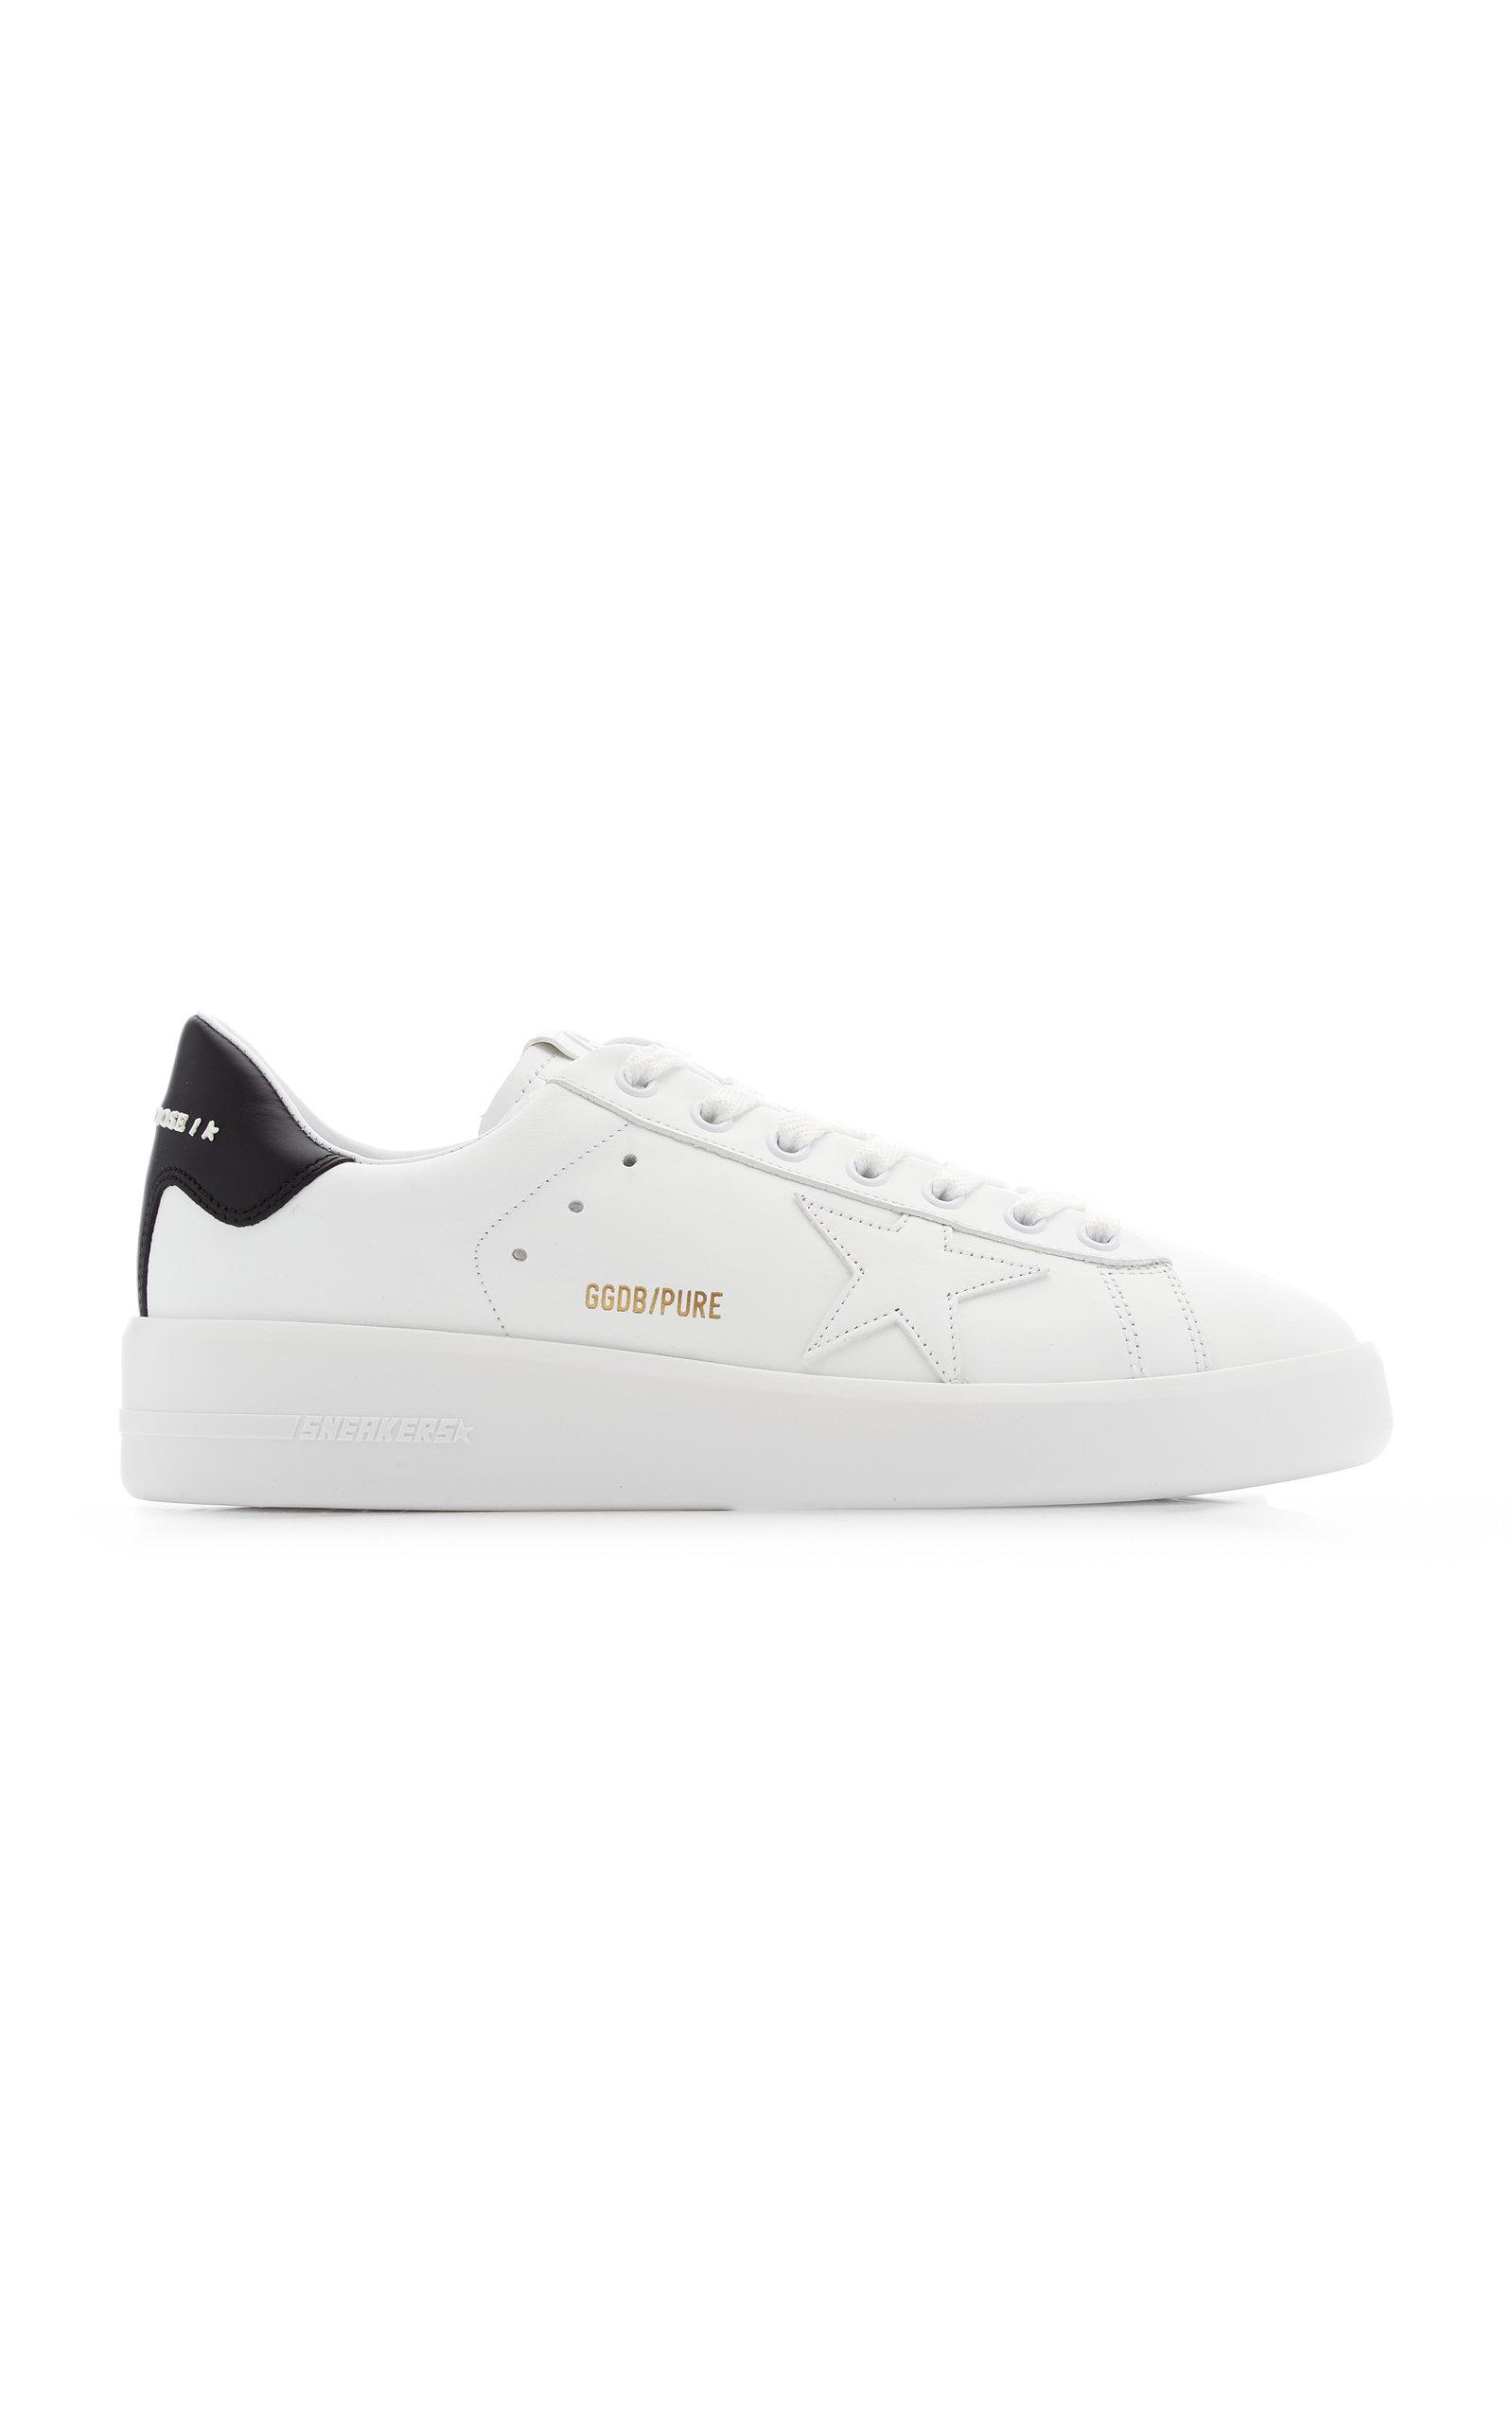 Golden Goose - Women's Pure Star Leather Sneakers - Black/white - Moda Operandi